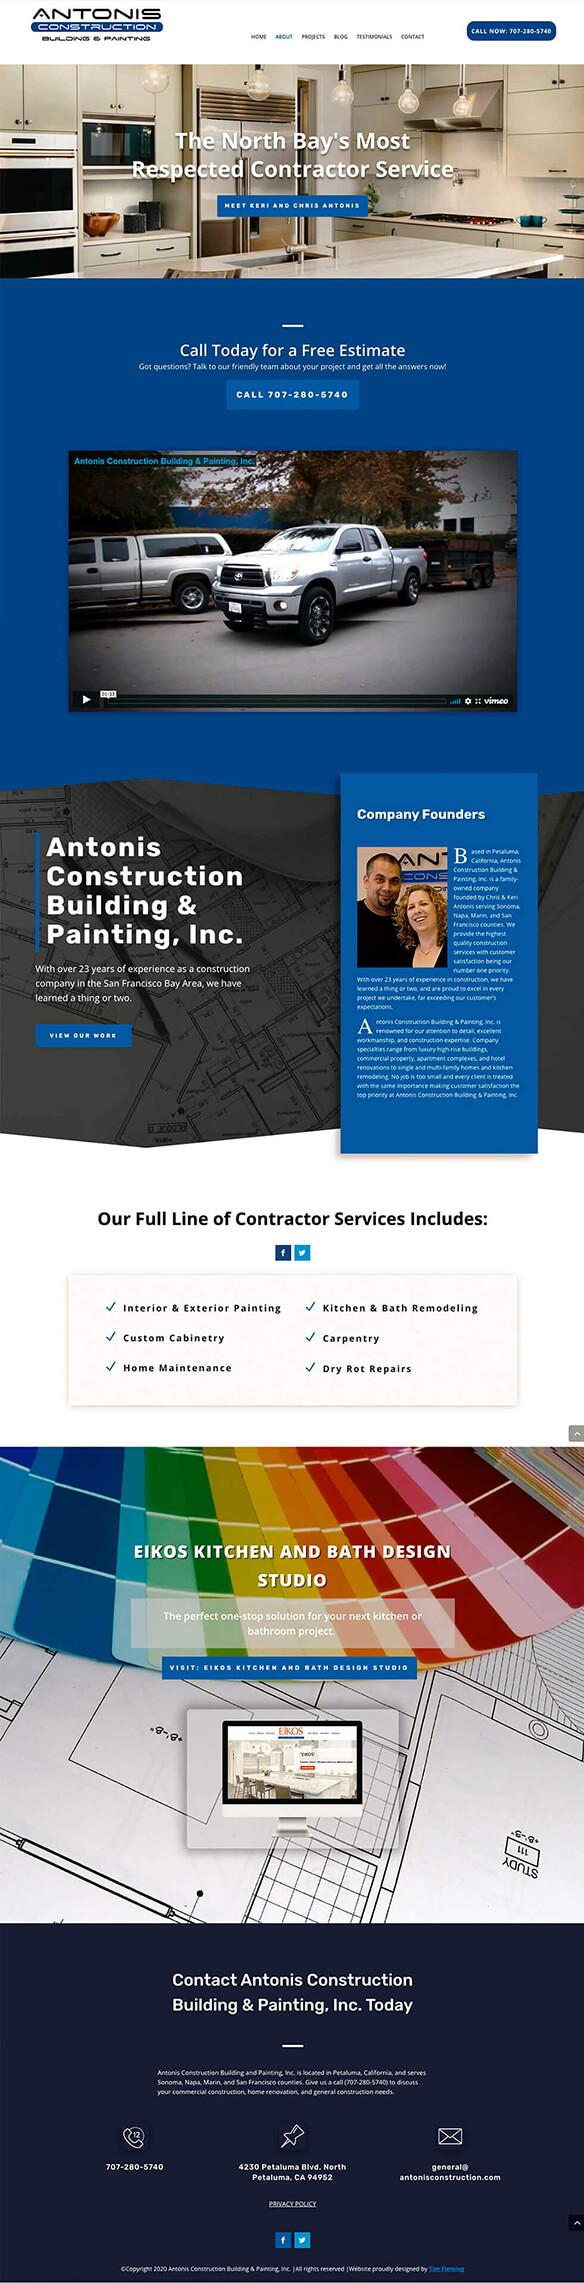 Antonis Construction home page mockup